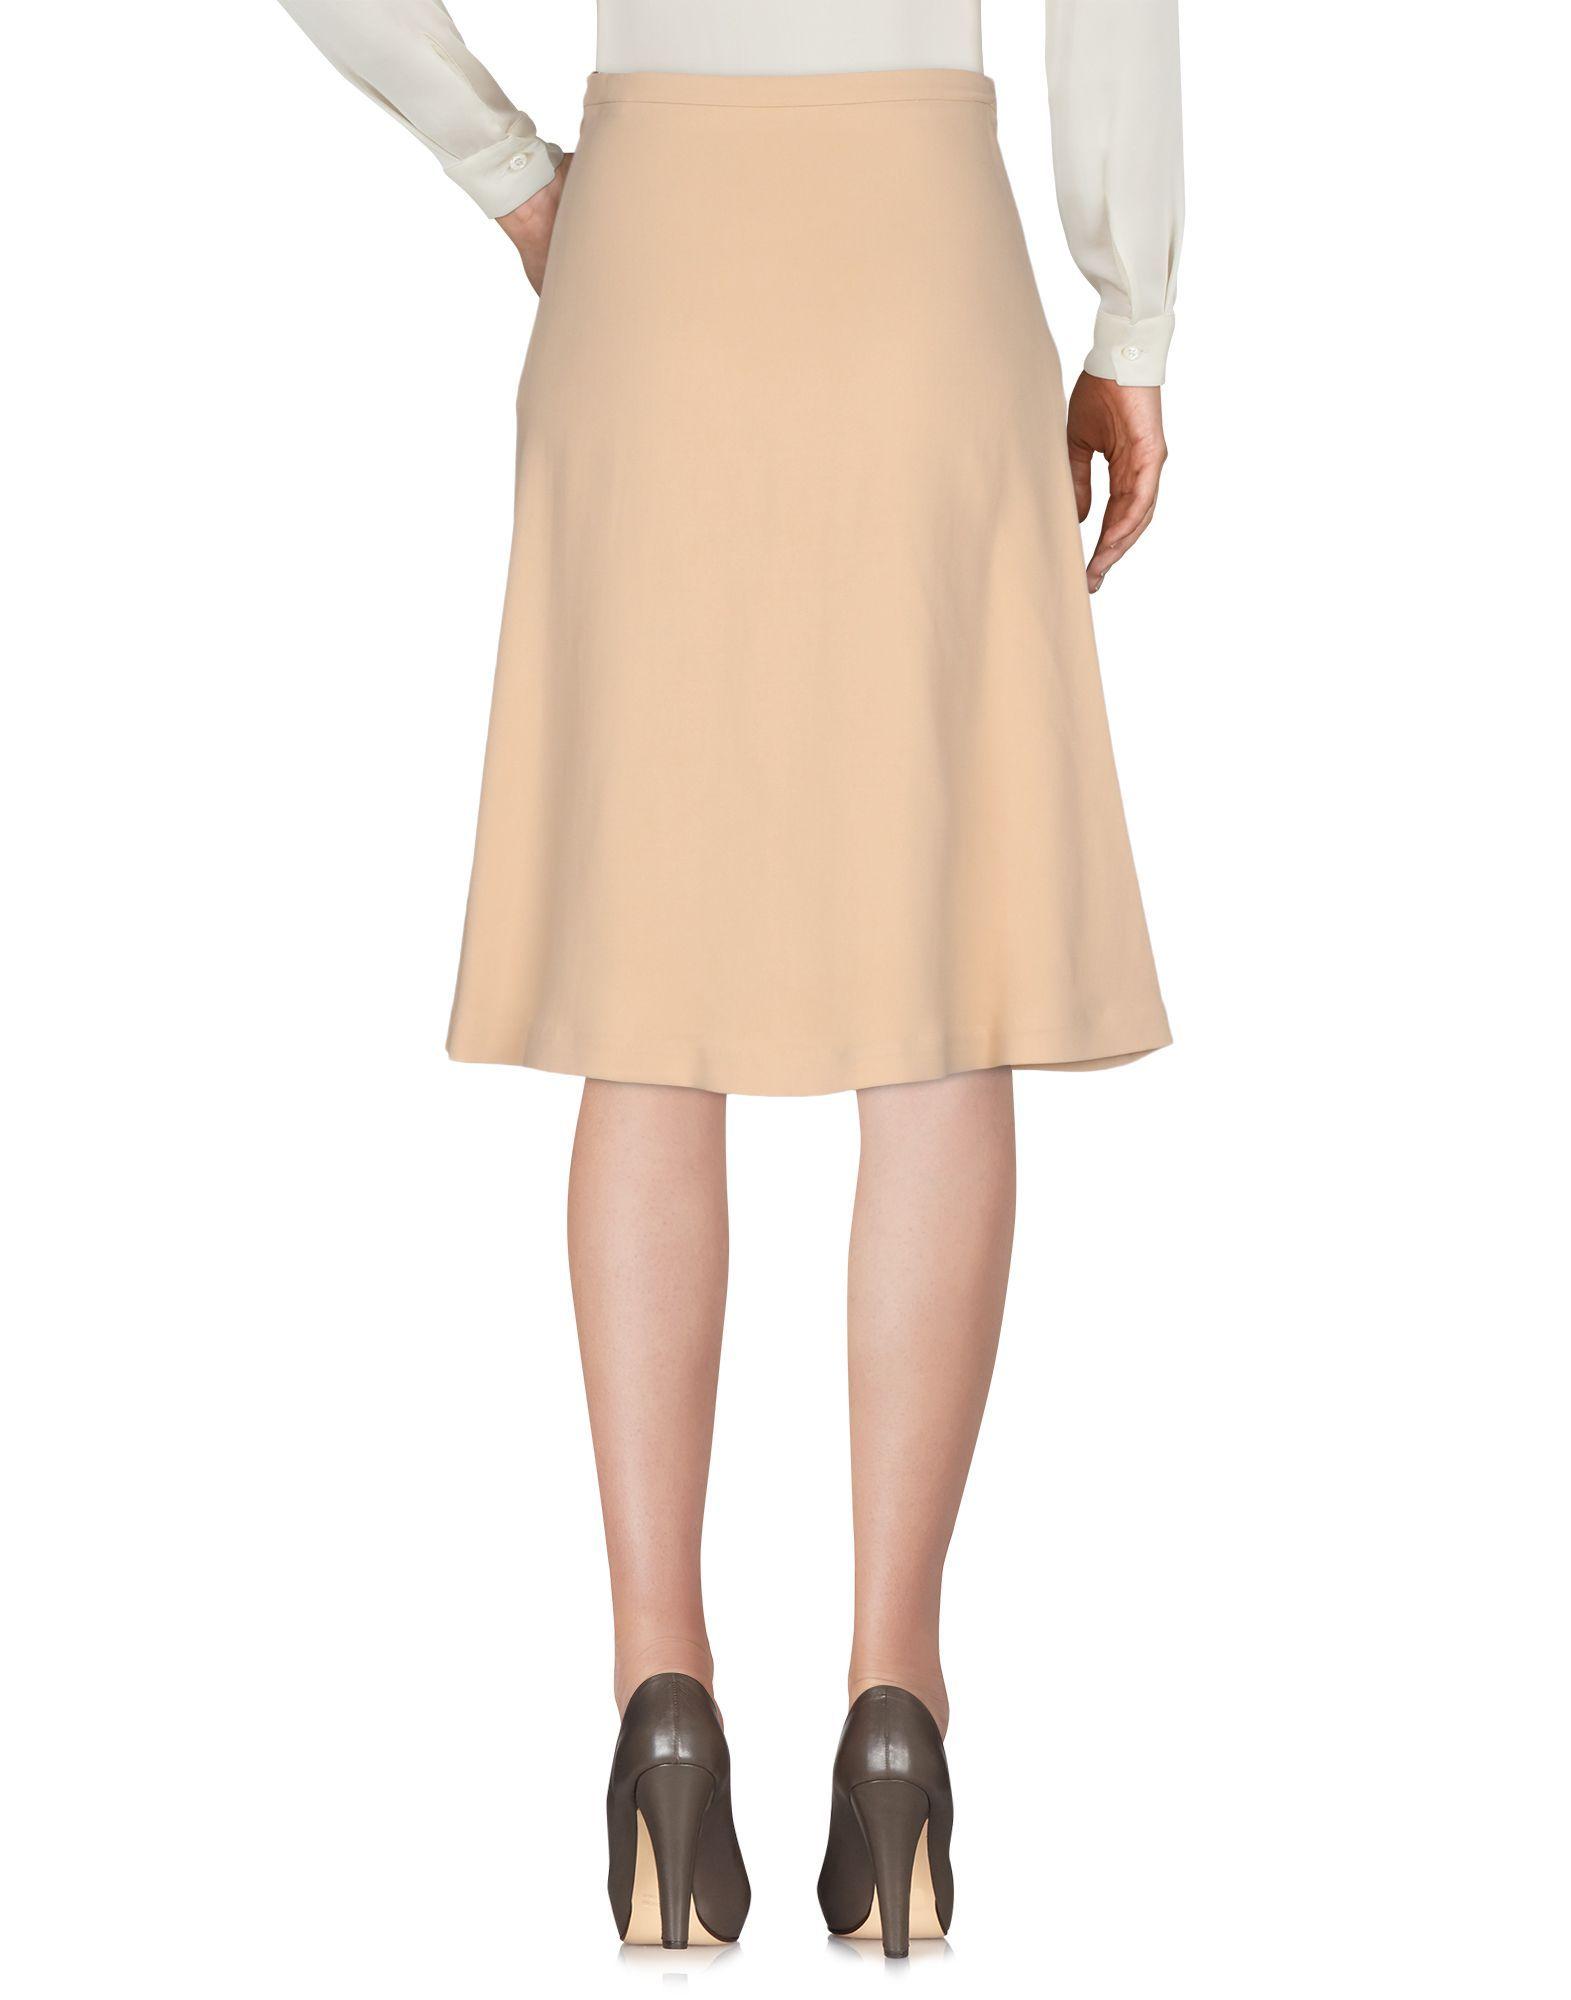 Elisabetta Franchi 24 Ore Sand Crepe Skirt